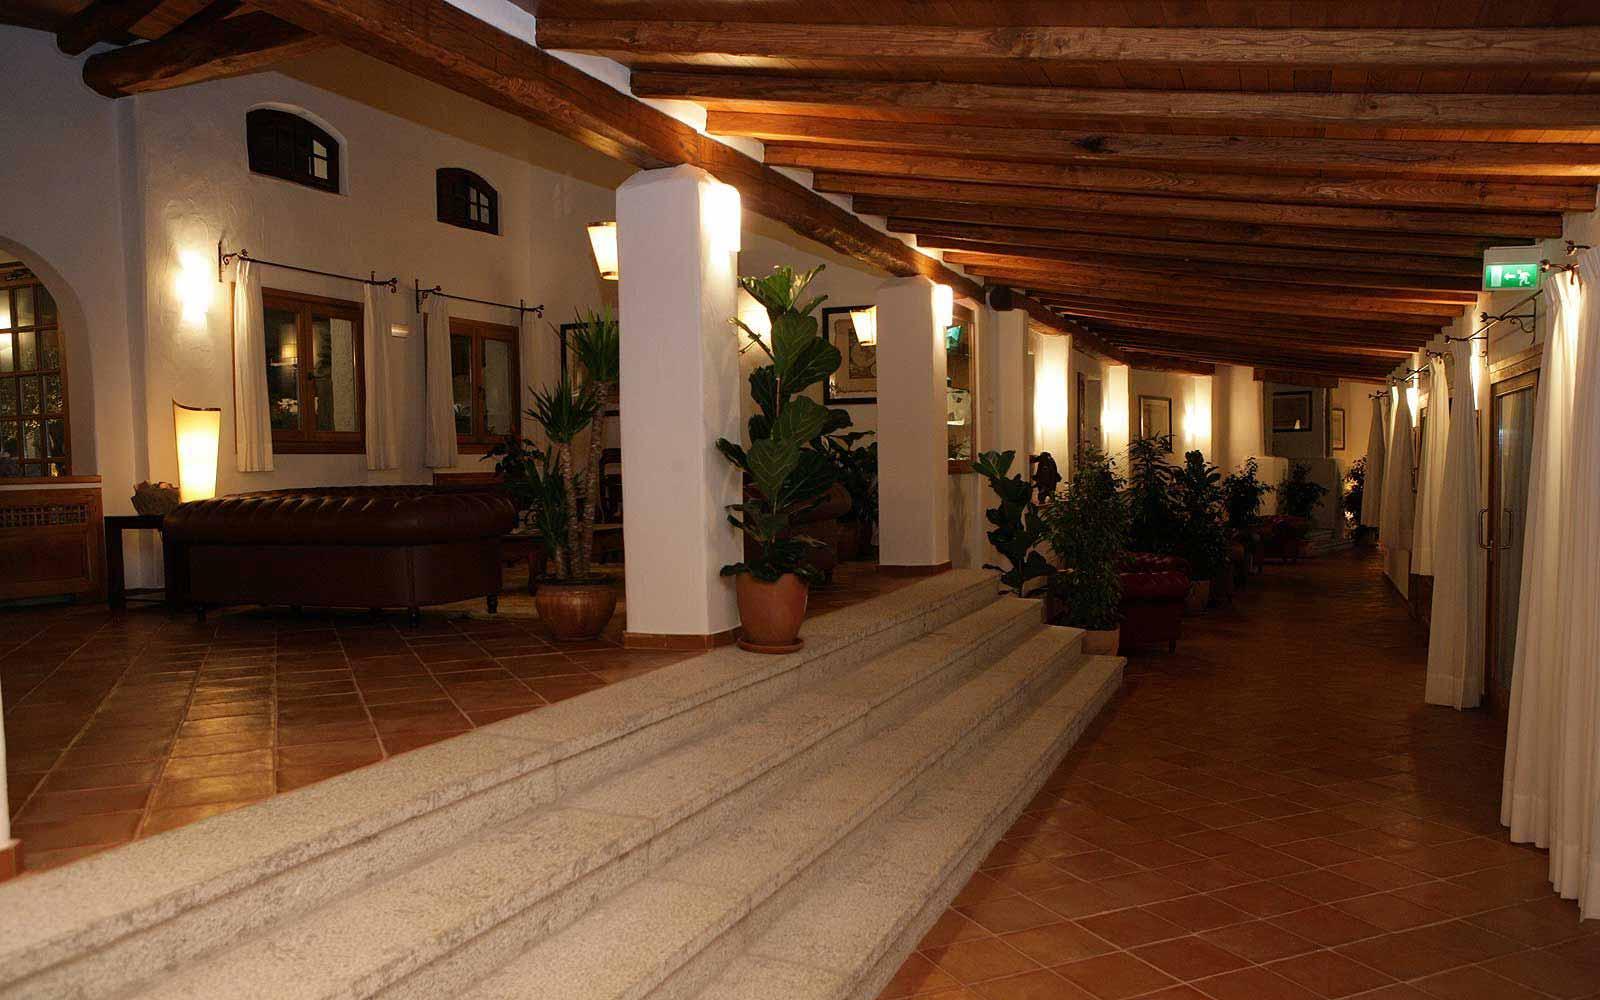 Interior of Hotel Sporting